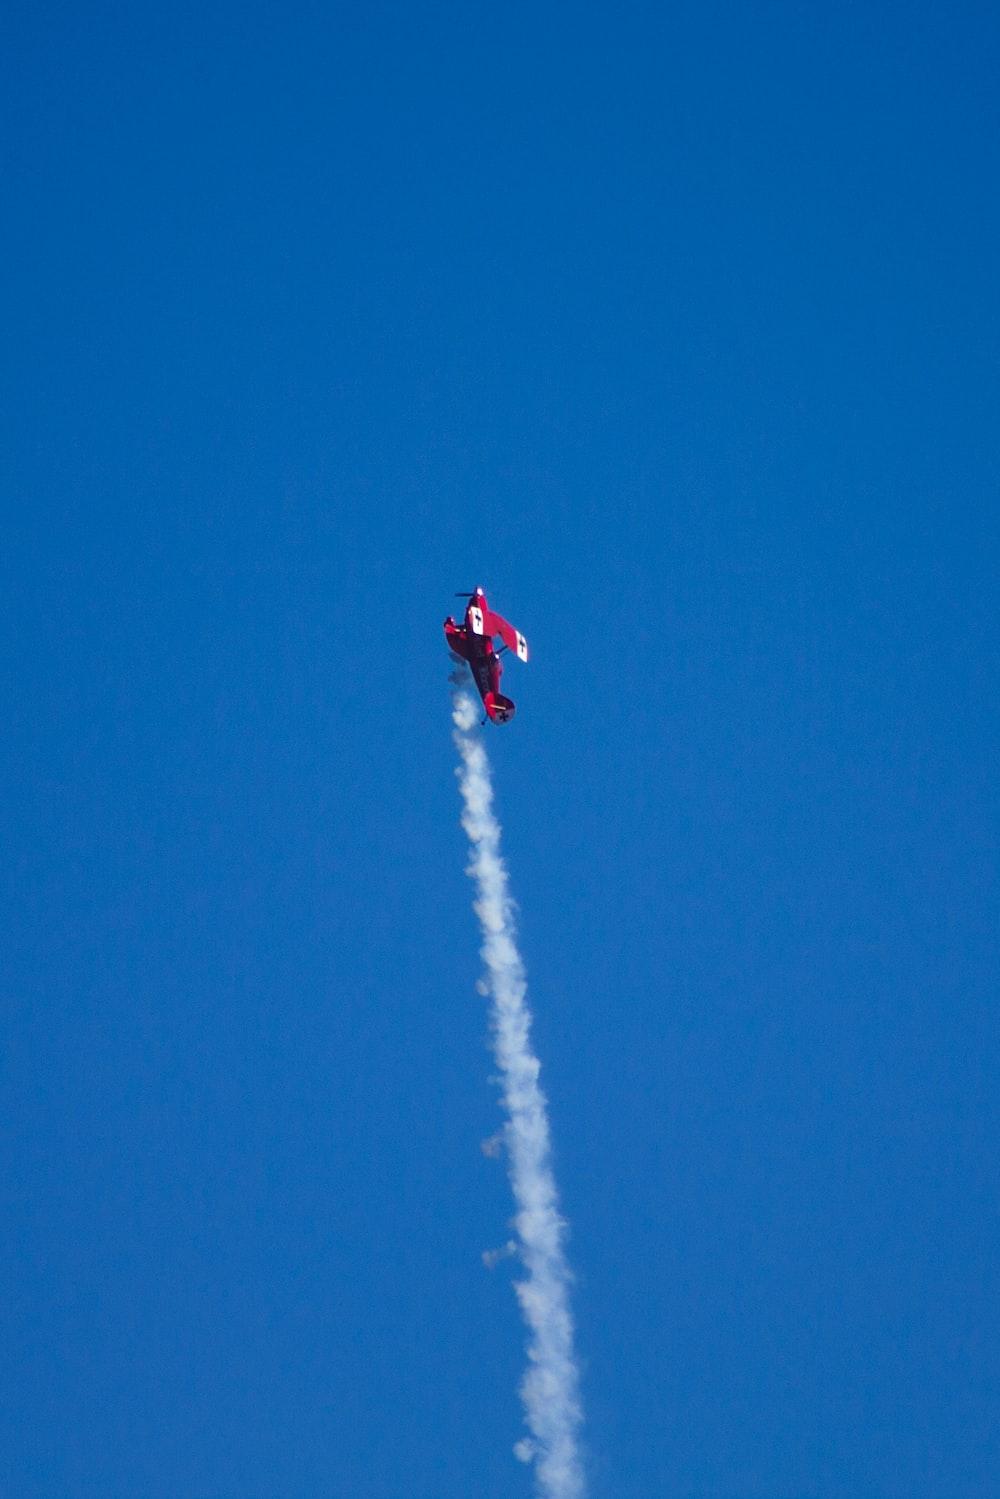 plane flying during daytime